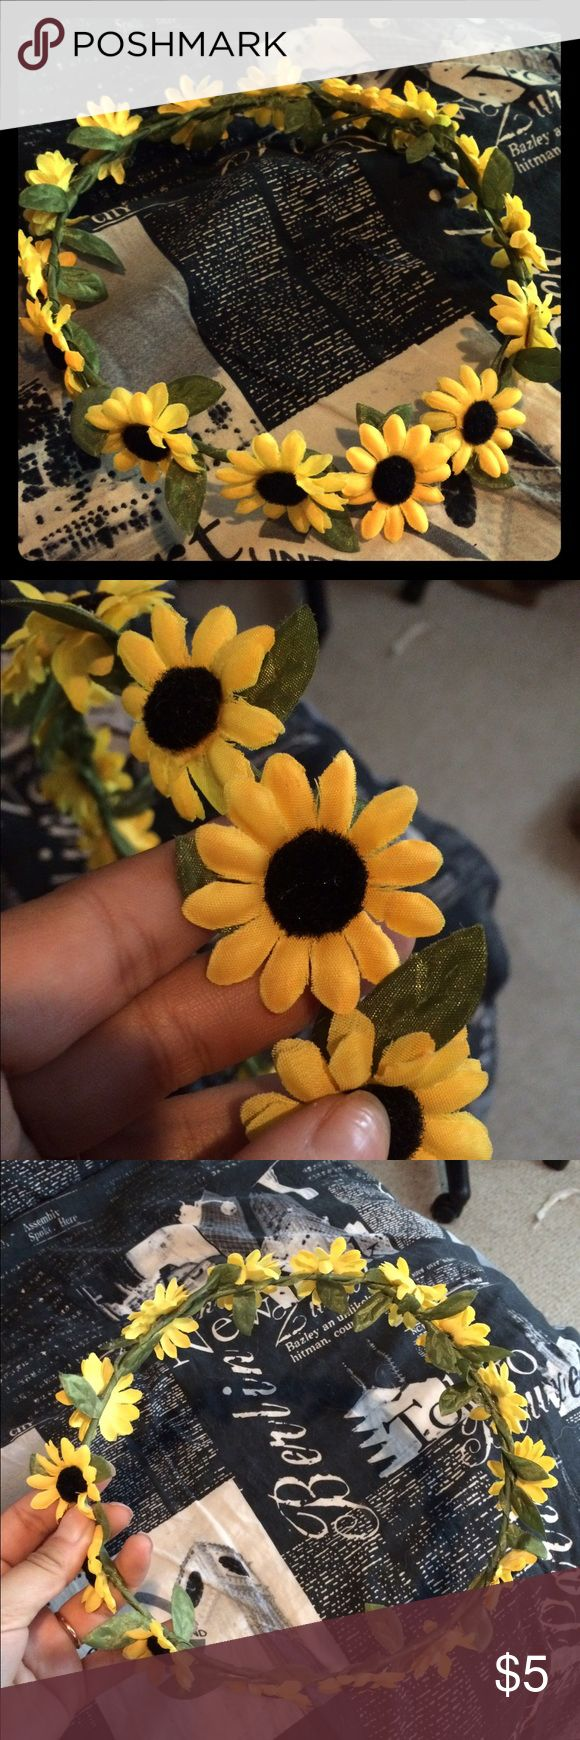 Sunflower headband Sunflower headband great for festivals WILL BUNDLE Accessories Hair Accessories